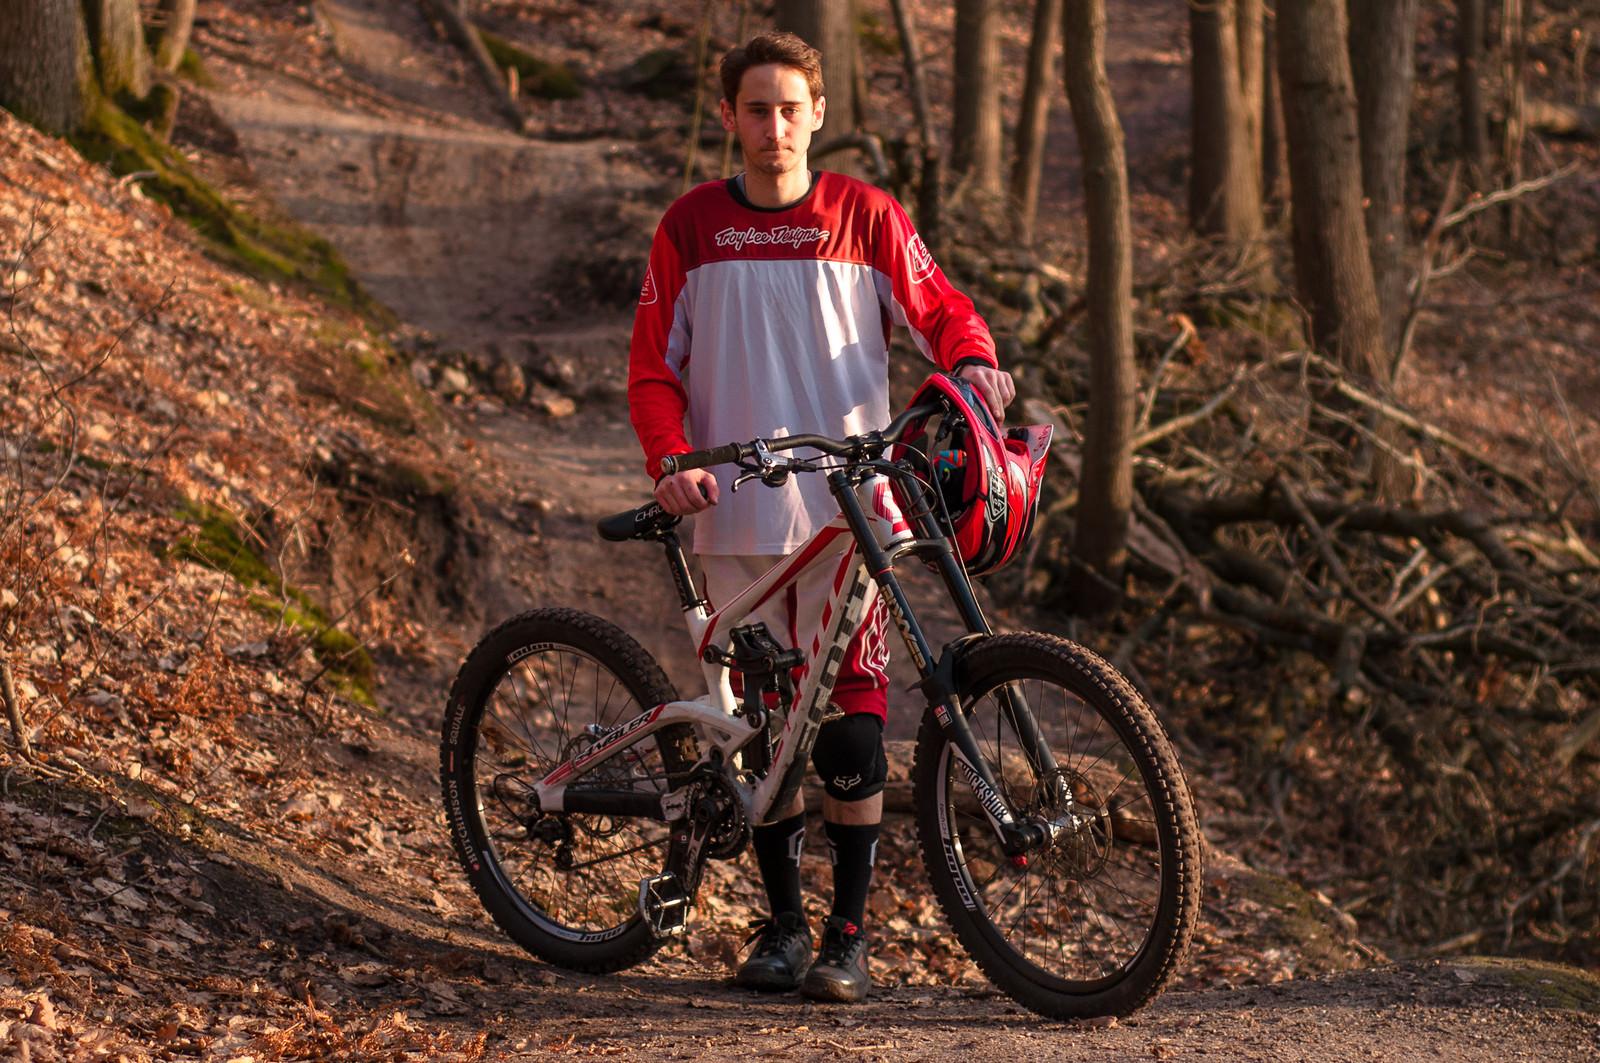 Me and my gambler - Romuald_Manach - Mountain Biking Pictures - Vital MTB